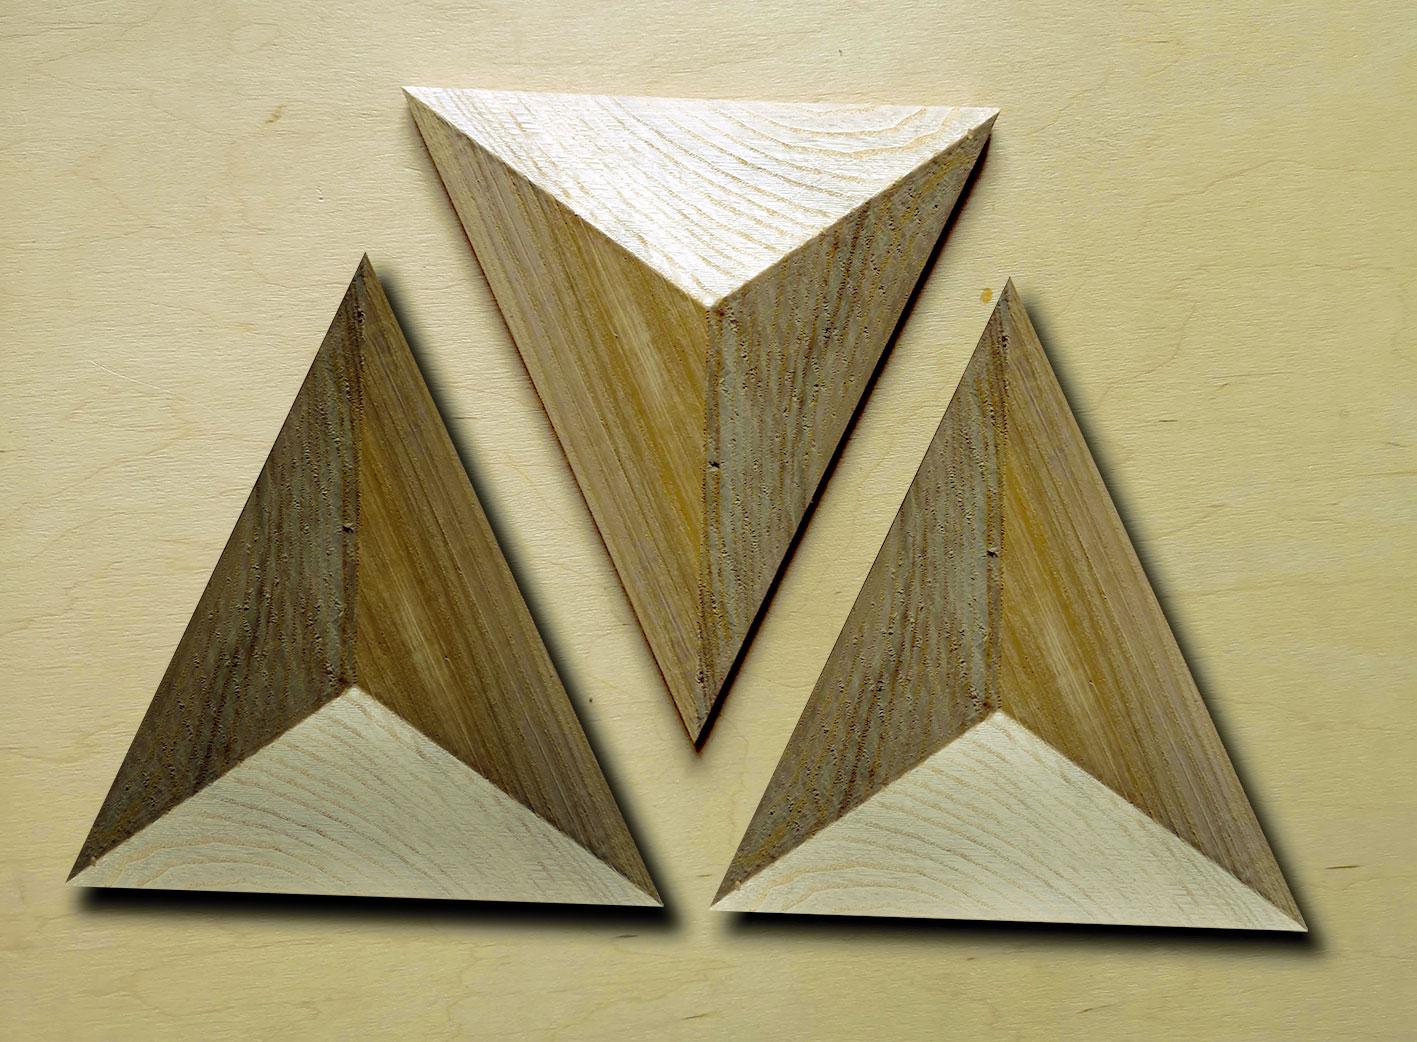 dekor-drewniany-piramida-3d